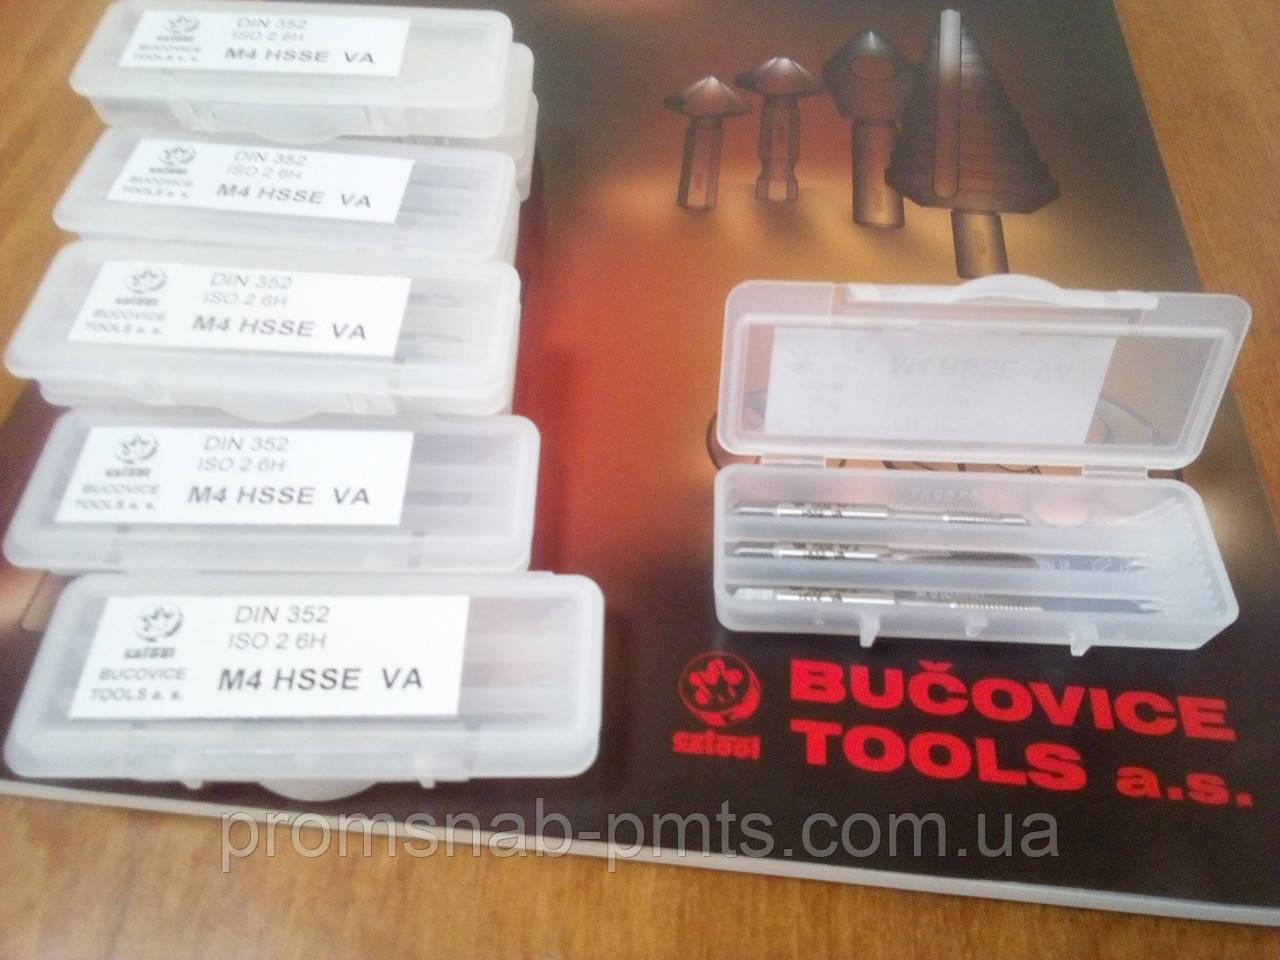 Метчик ручной HSS-E М4х0,7 VA ISO 2 6H DIN 352 комплект из 3-х шт.